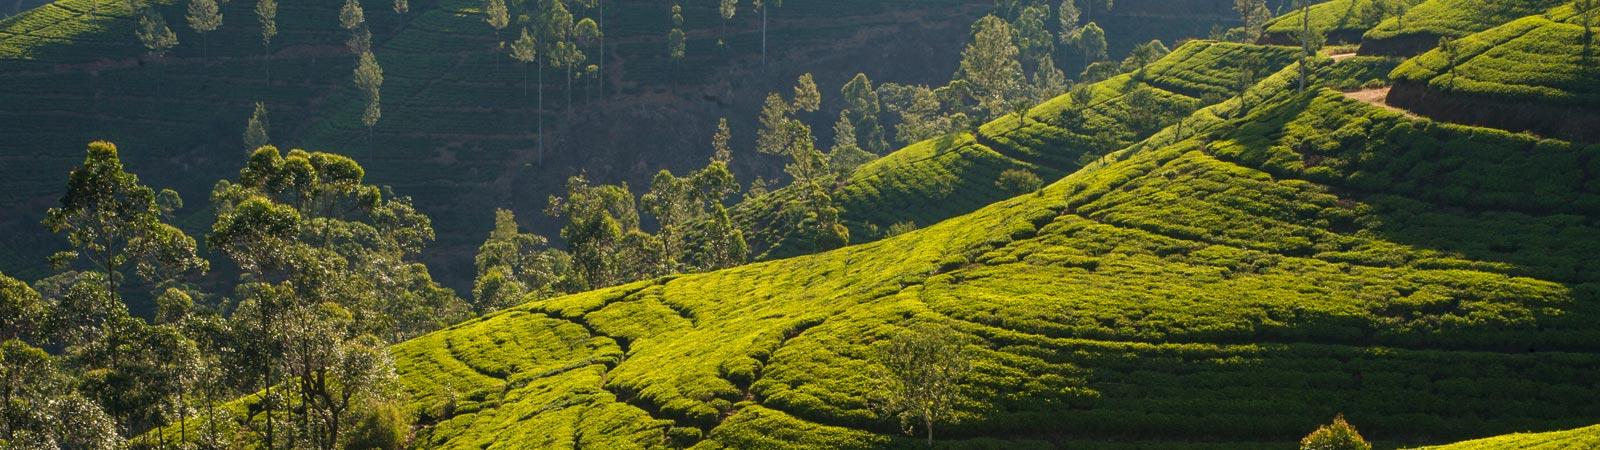 Tea Plantation estates of MJF Exports